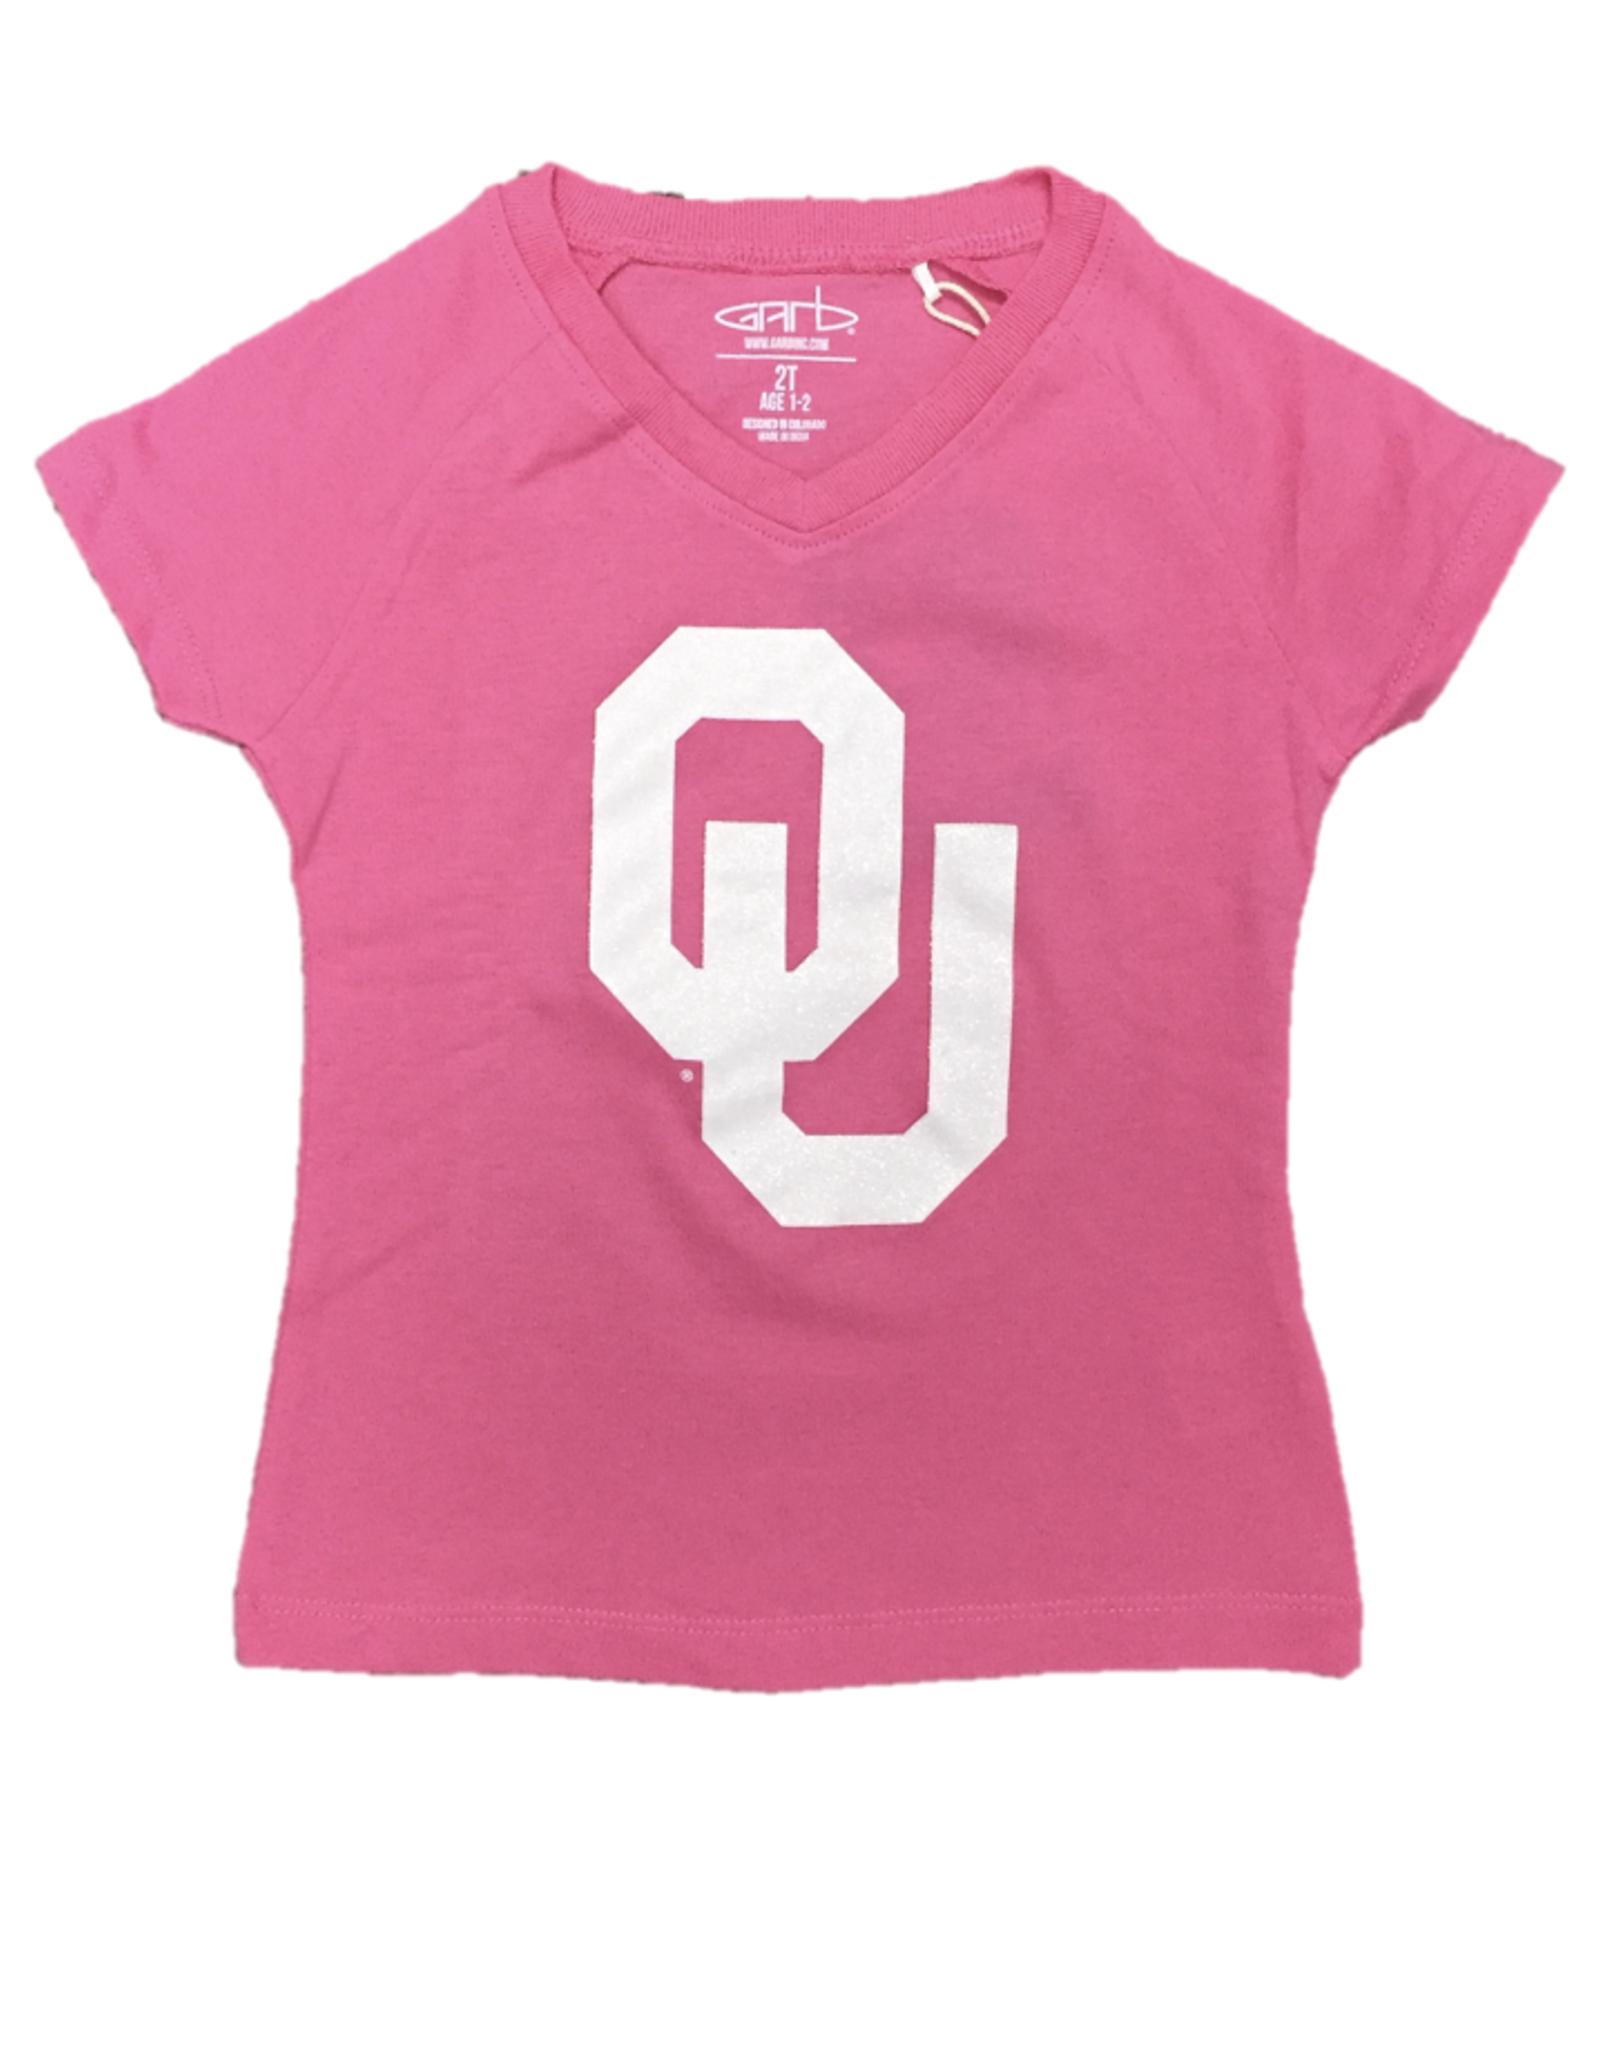 Garb Girls' Toddler Pink OU Glitter V-Neck Tee